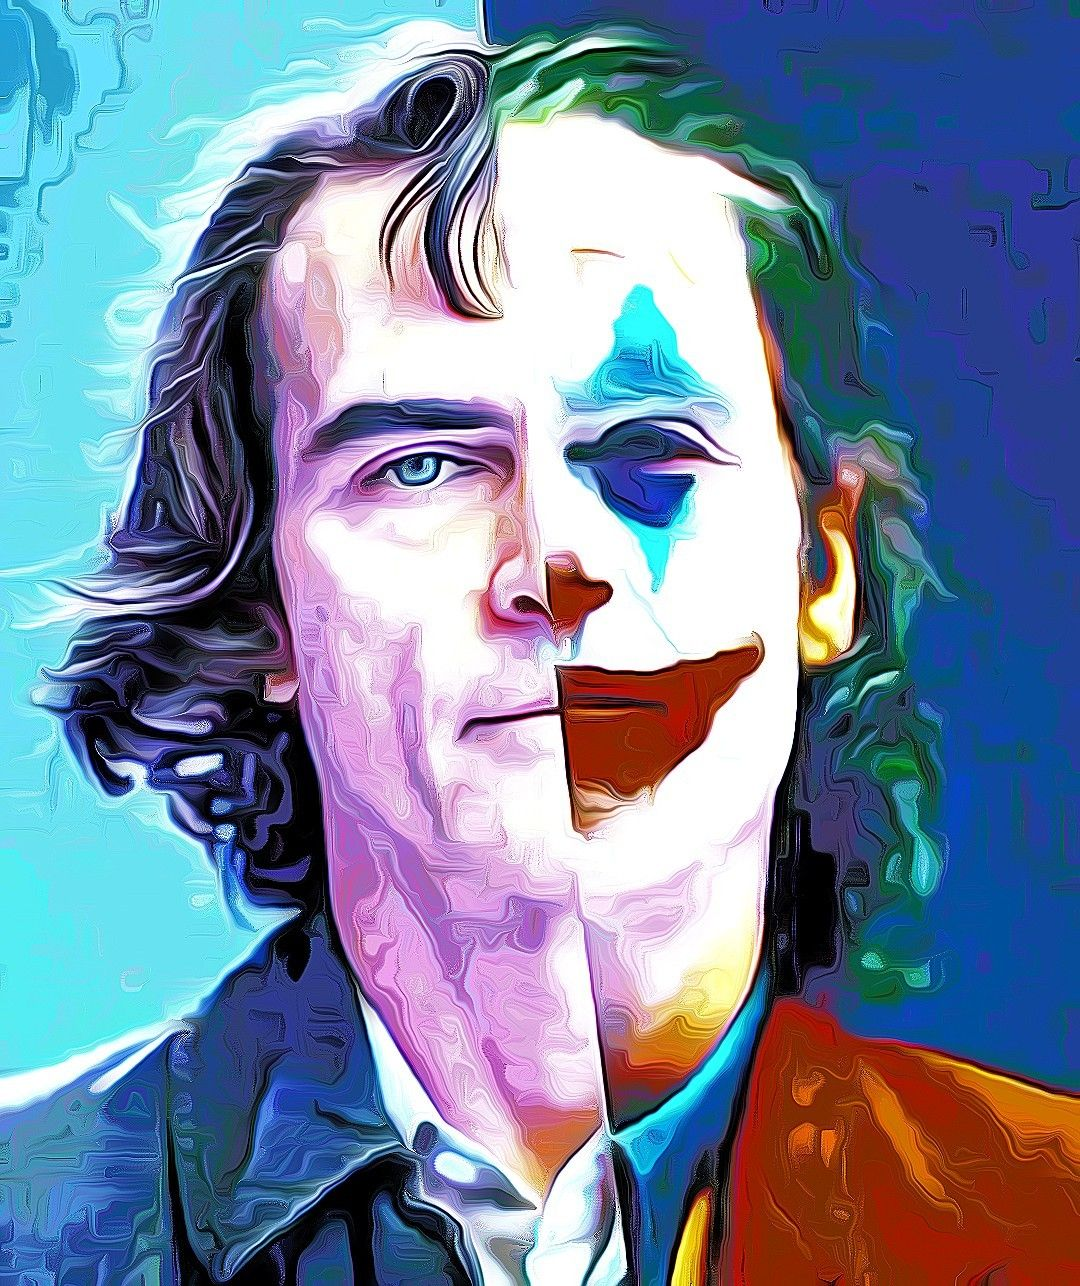 #joker #jokermovie #joaquinphoenix #dc # ...